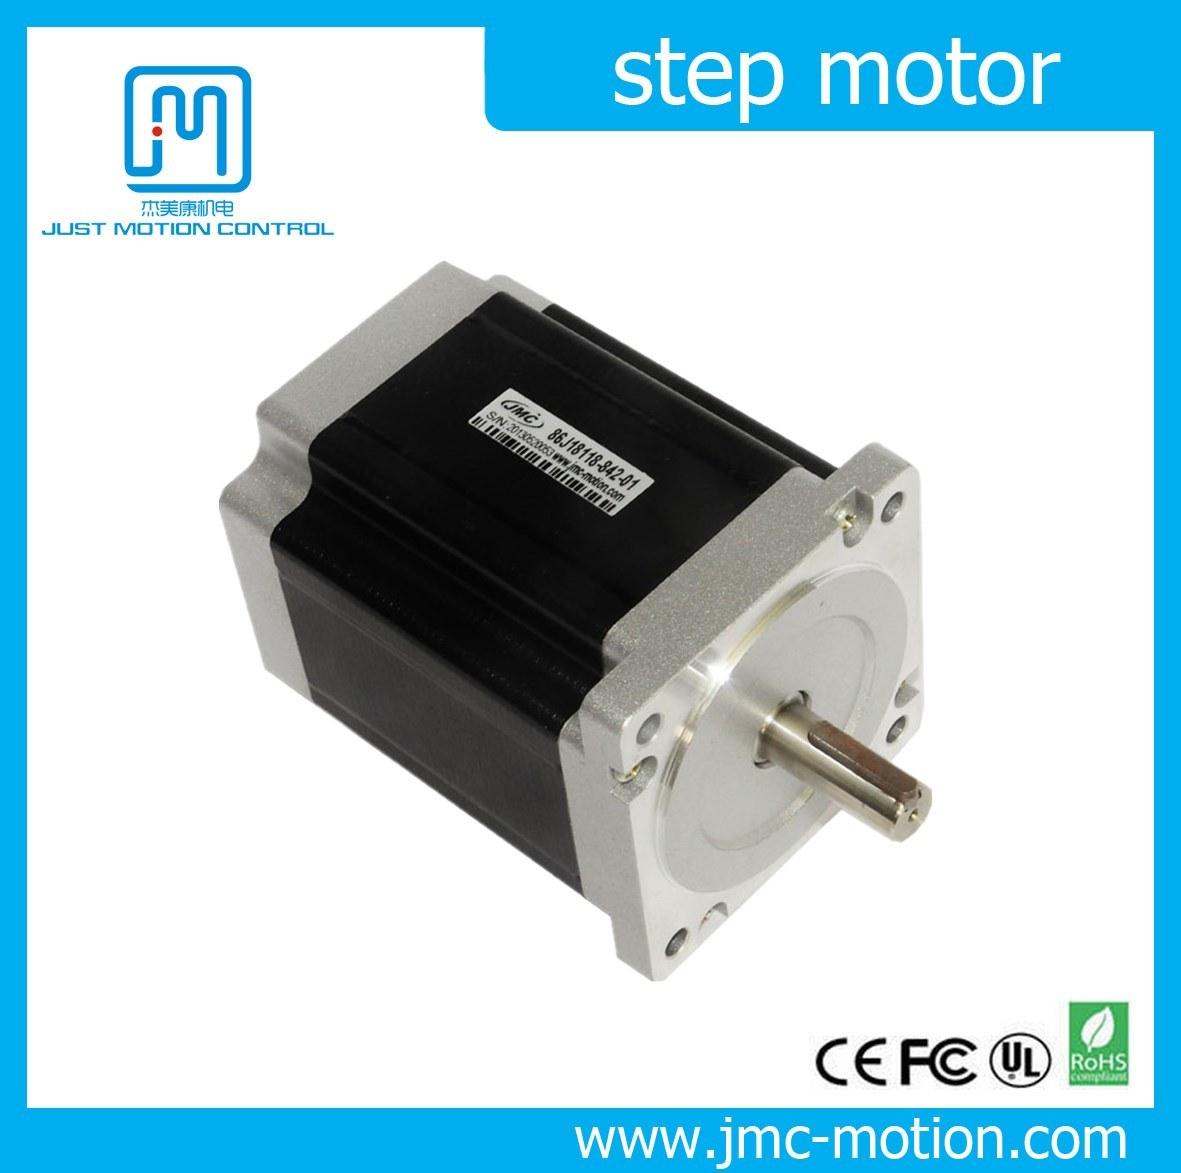 CNC Machine Parts Size 86mm 2 Phase NEMA34 High Torque DC Motor